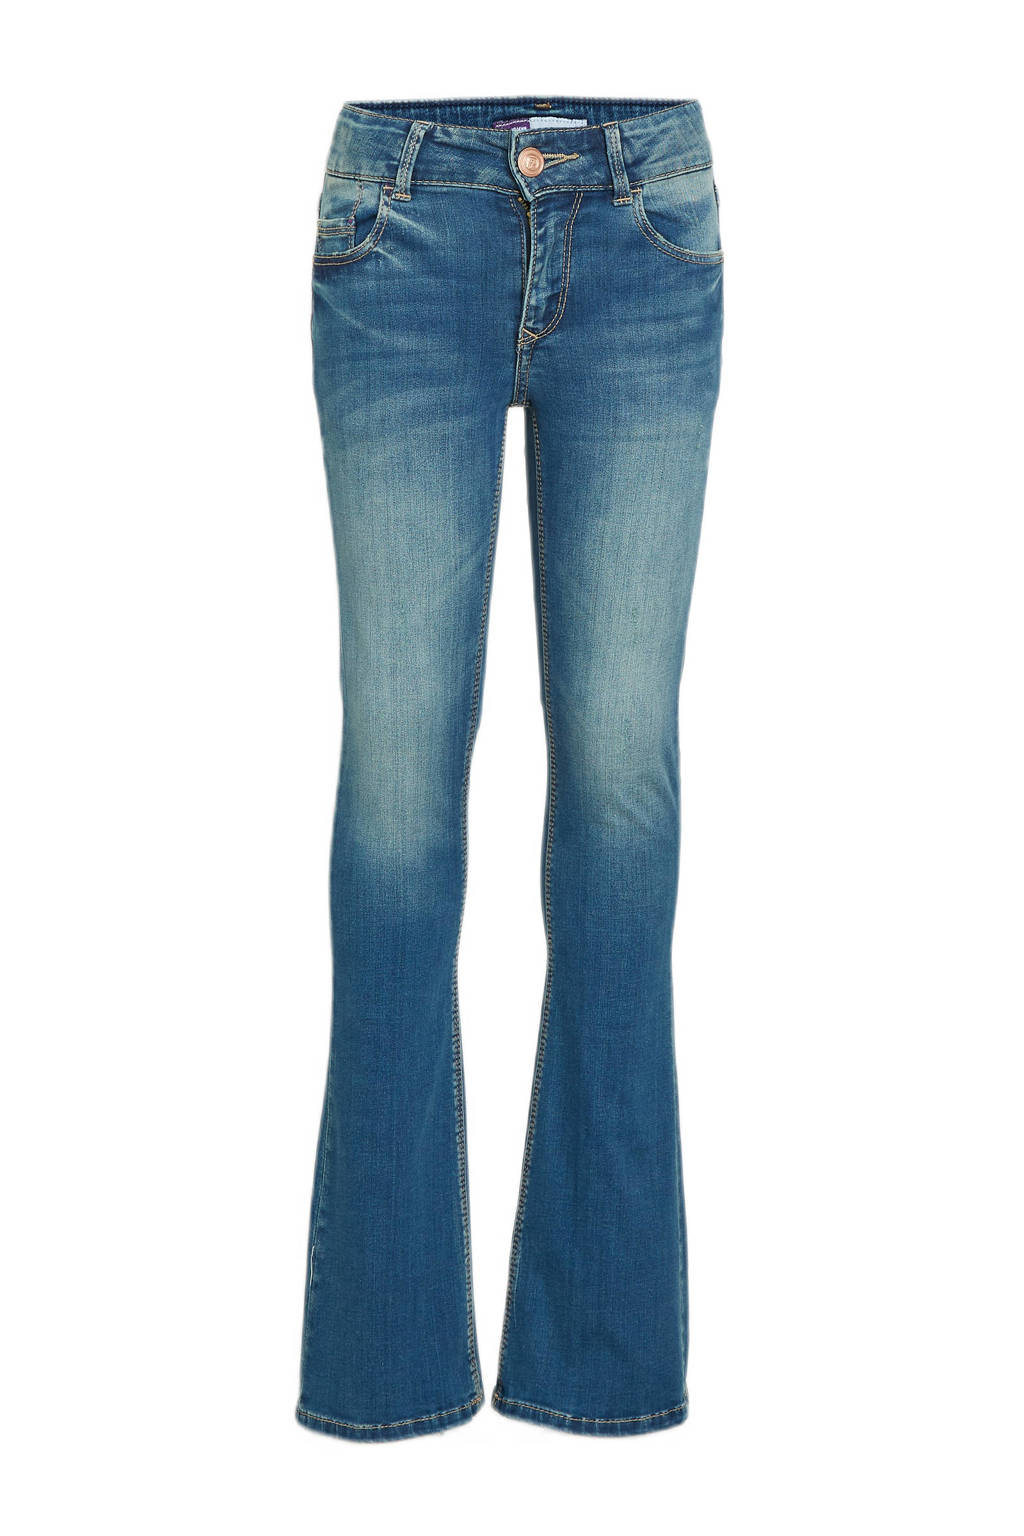 Raizzed flared jeans Melbourne mid blue stone, Mid blue stone